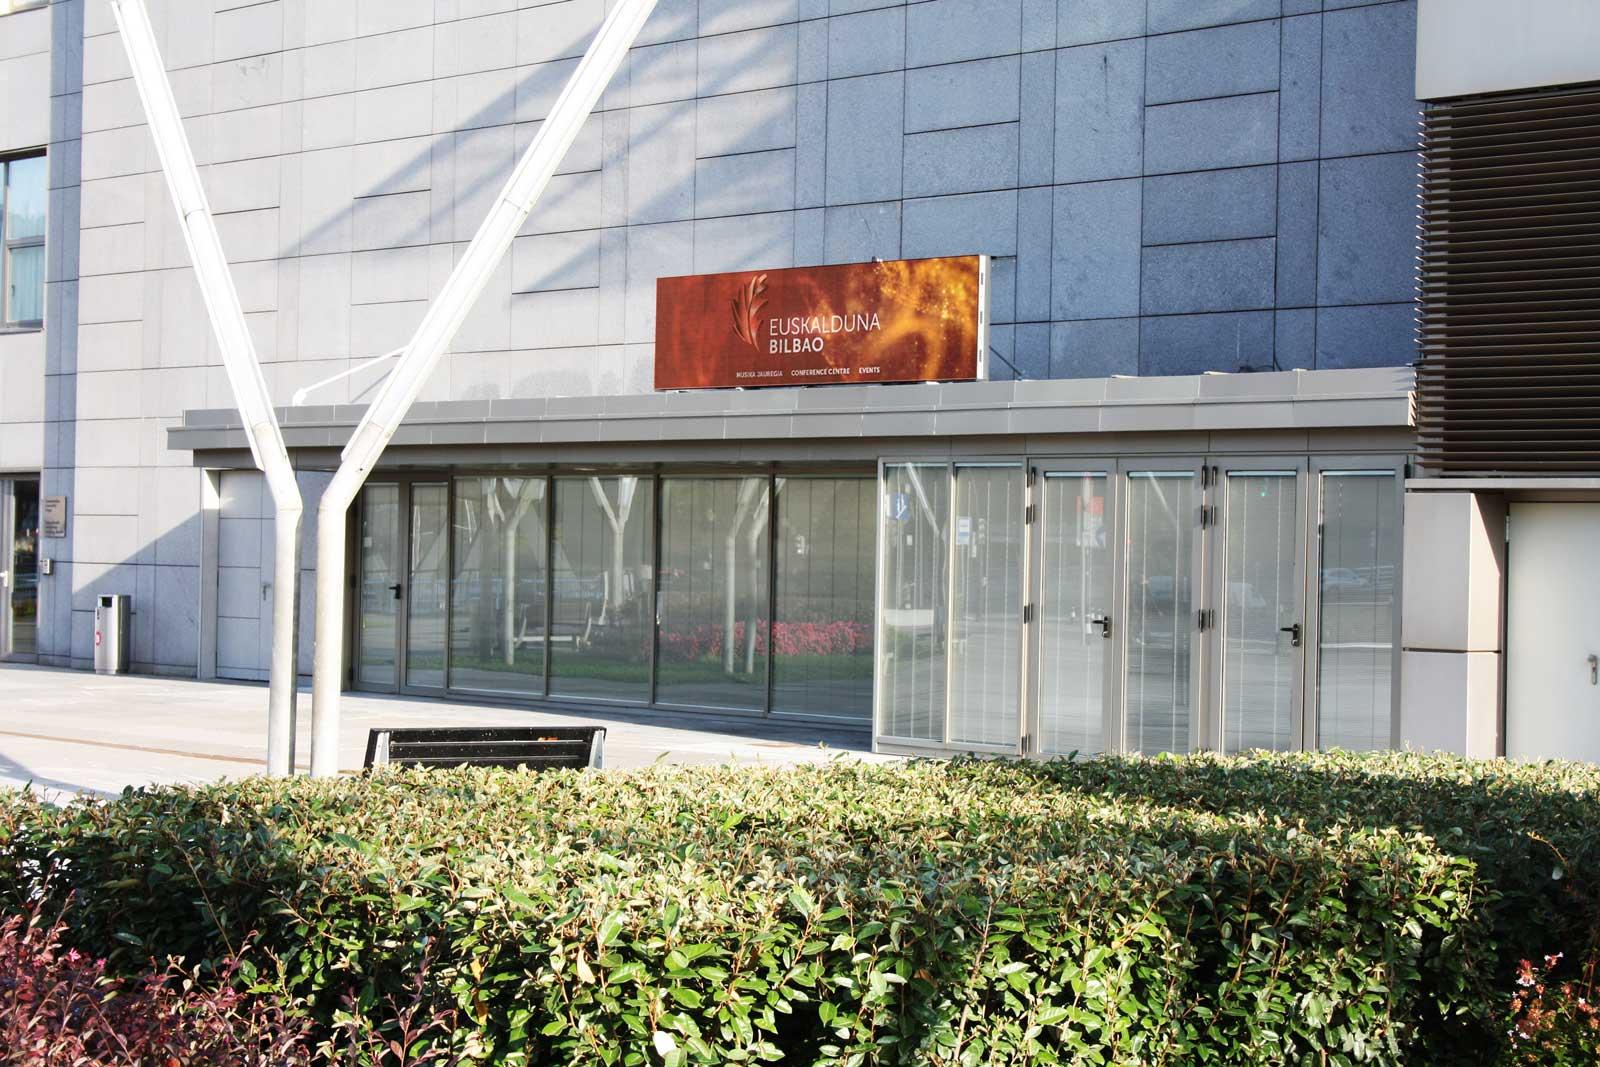 Palacio-Euskalduna-LedDream-montajes-led